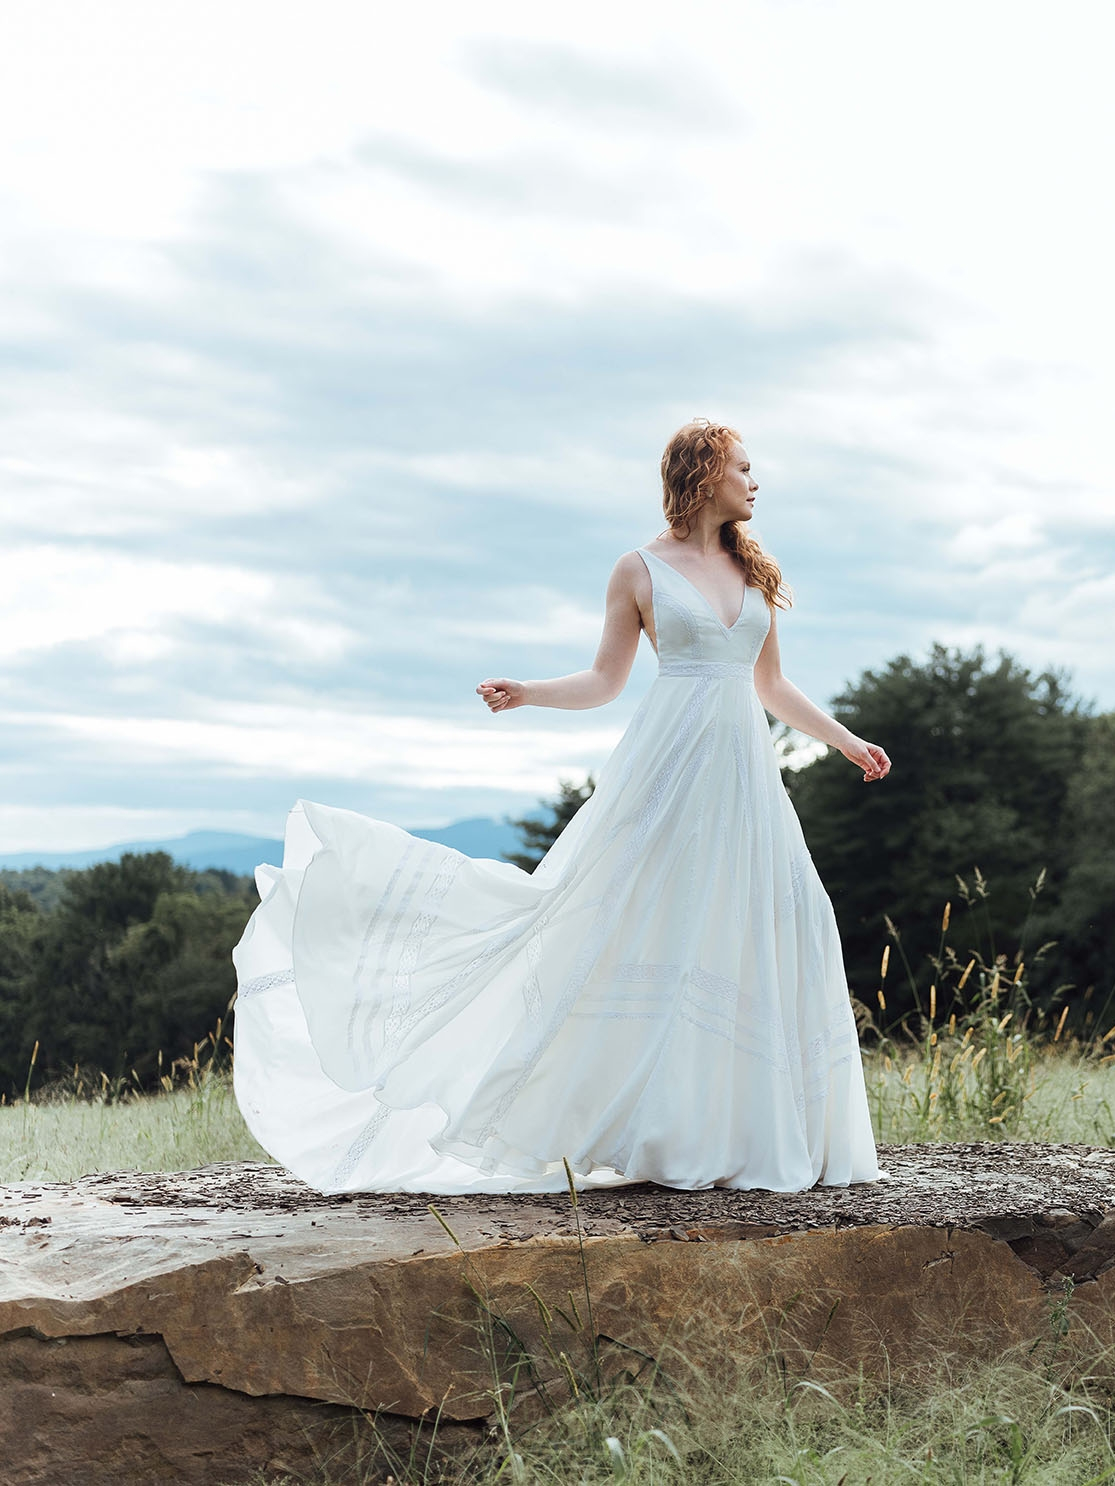 Theosz6edit1_Rebecc_Schoneveld_romantic_wedding_dress_custom_looks.jpg